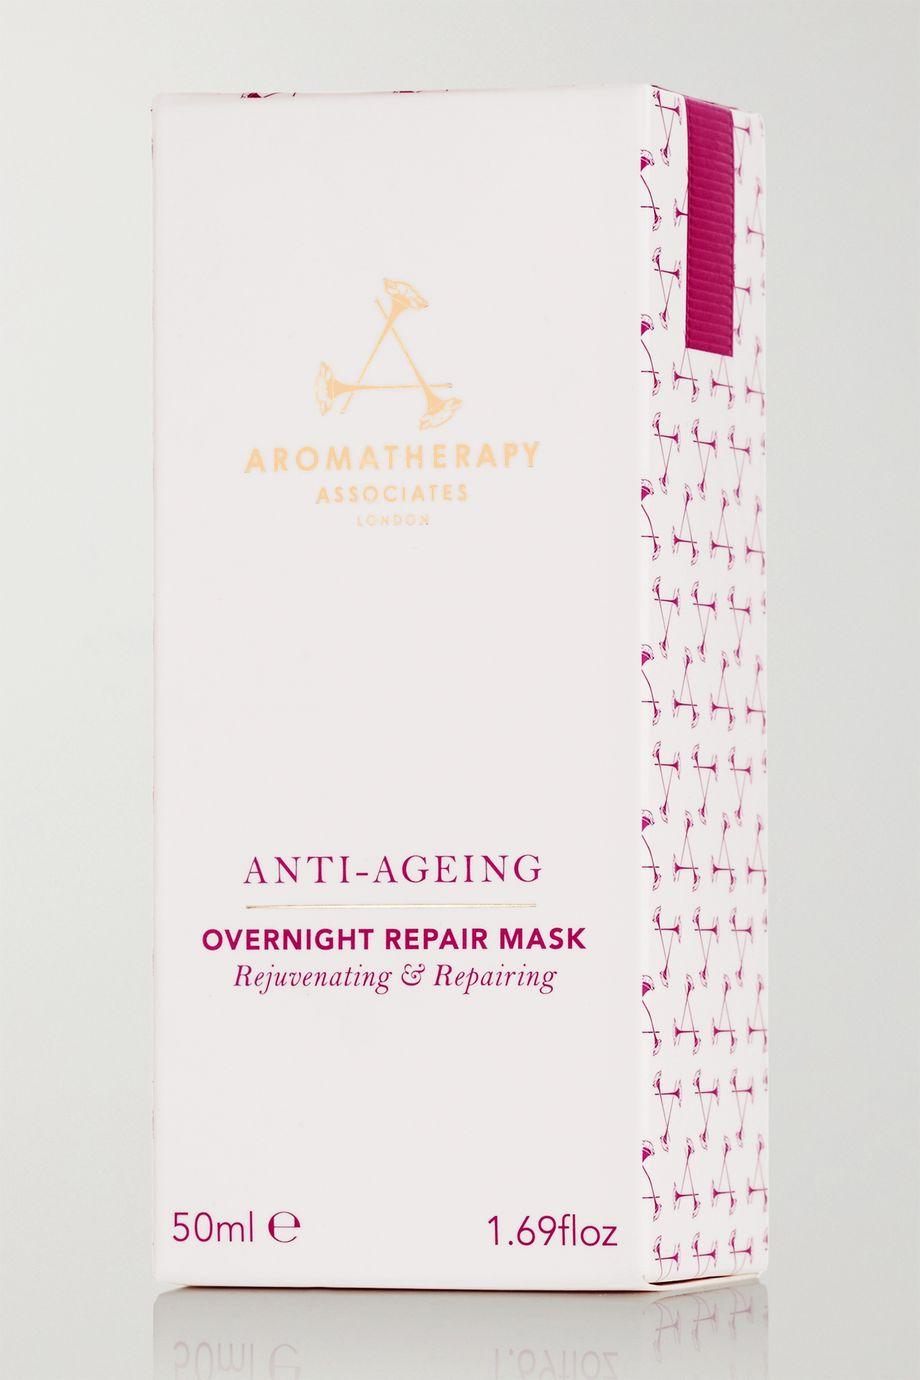 Aromatherapy Associates Overnight Repair Mask, 50ml